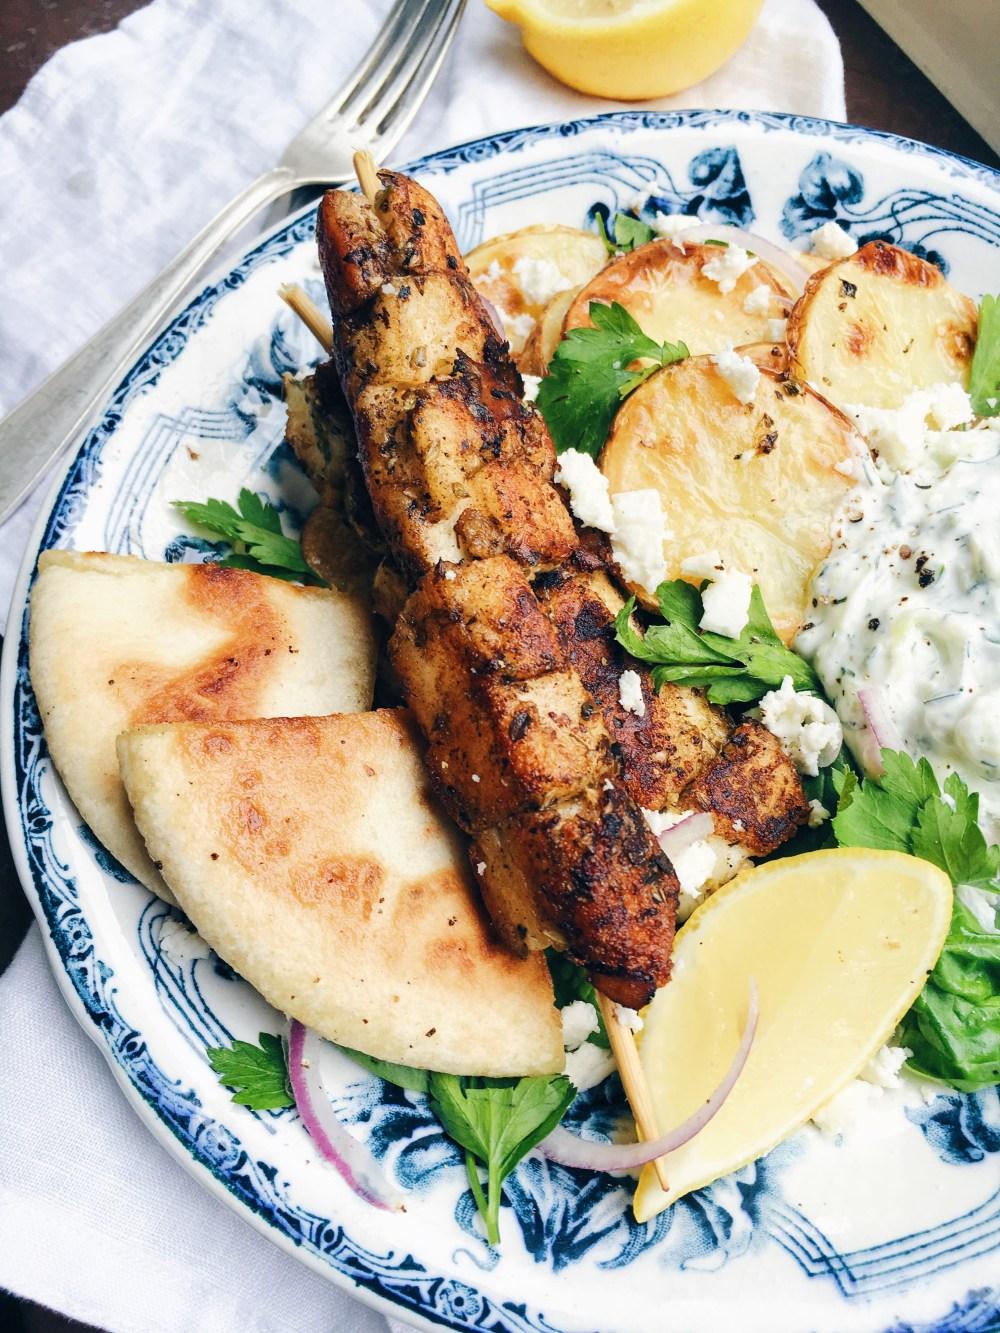 Halloumisouvlaki, vegetarisk sovlaki med rostad potatis och tzatziki